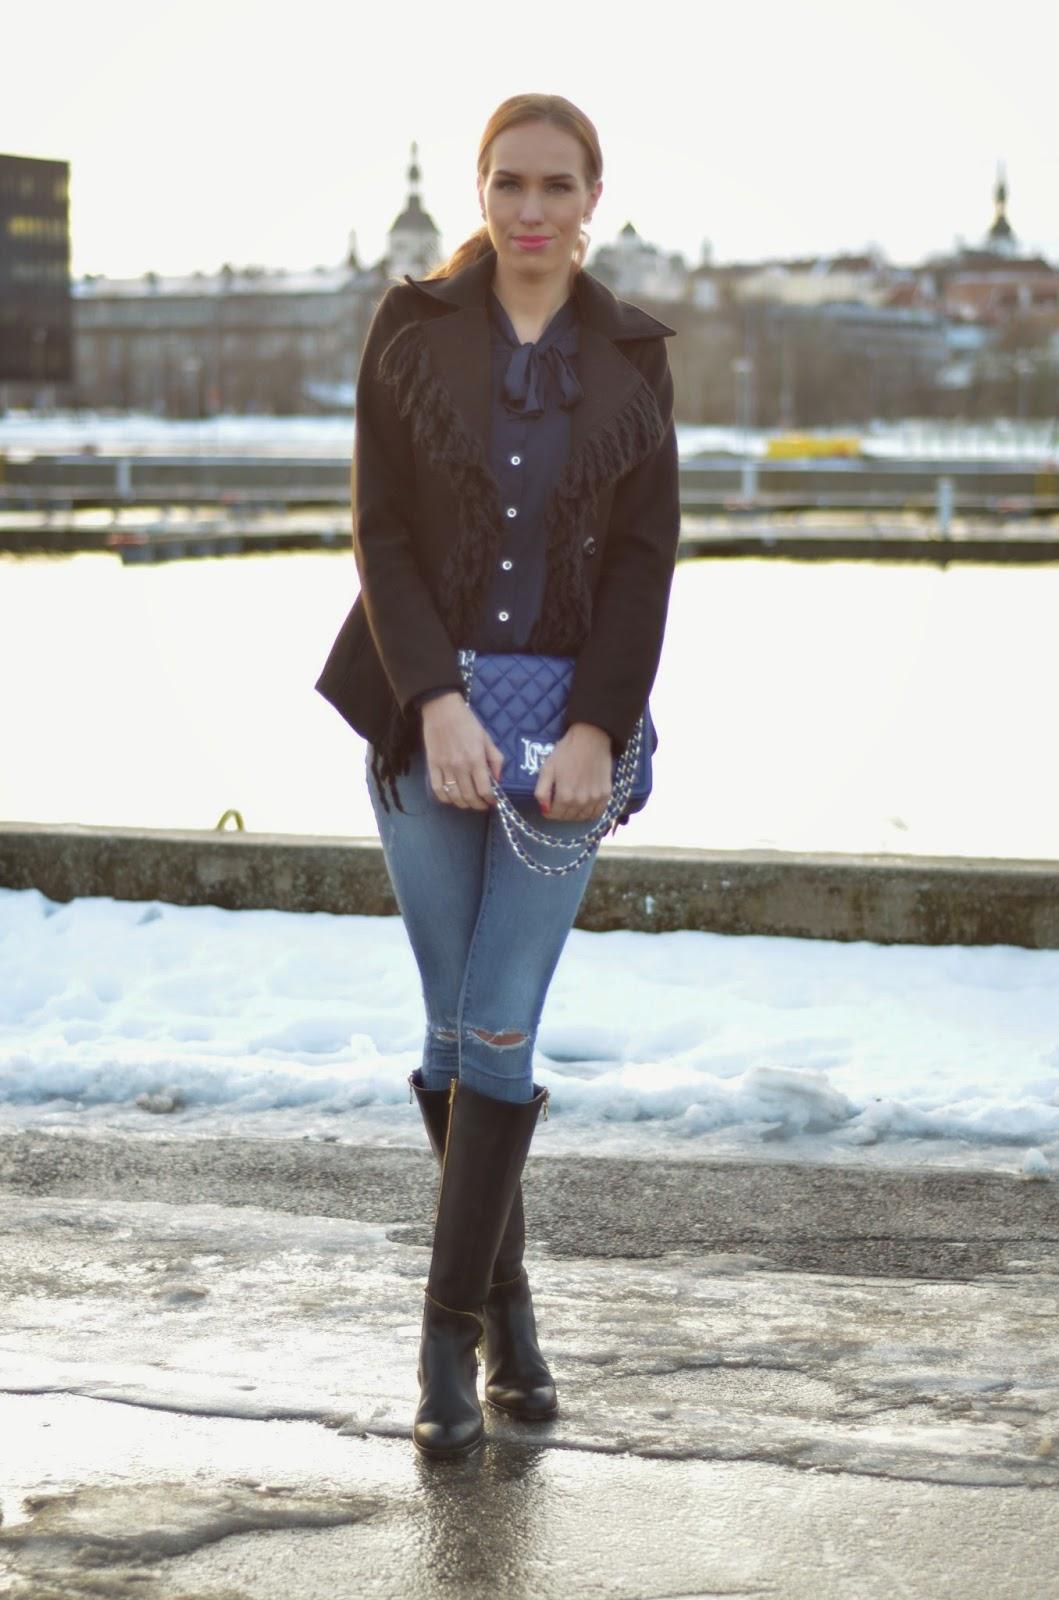 noa-knee-high-boots-zara-ripped-jeans-moschino-bag kristjaana mere